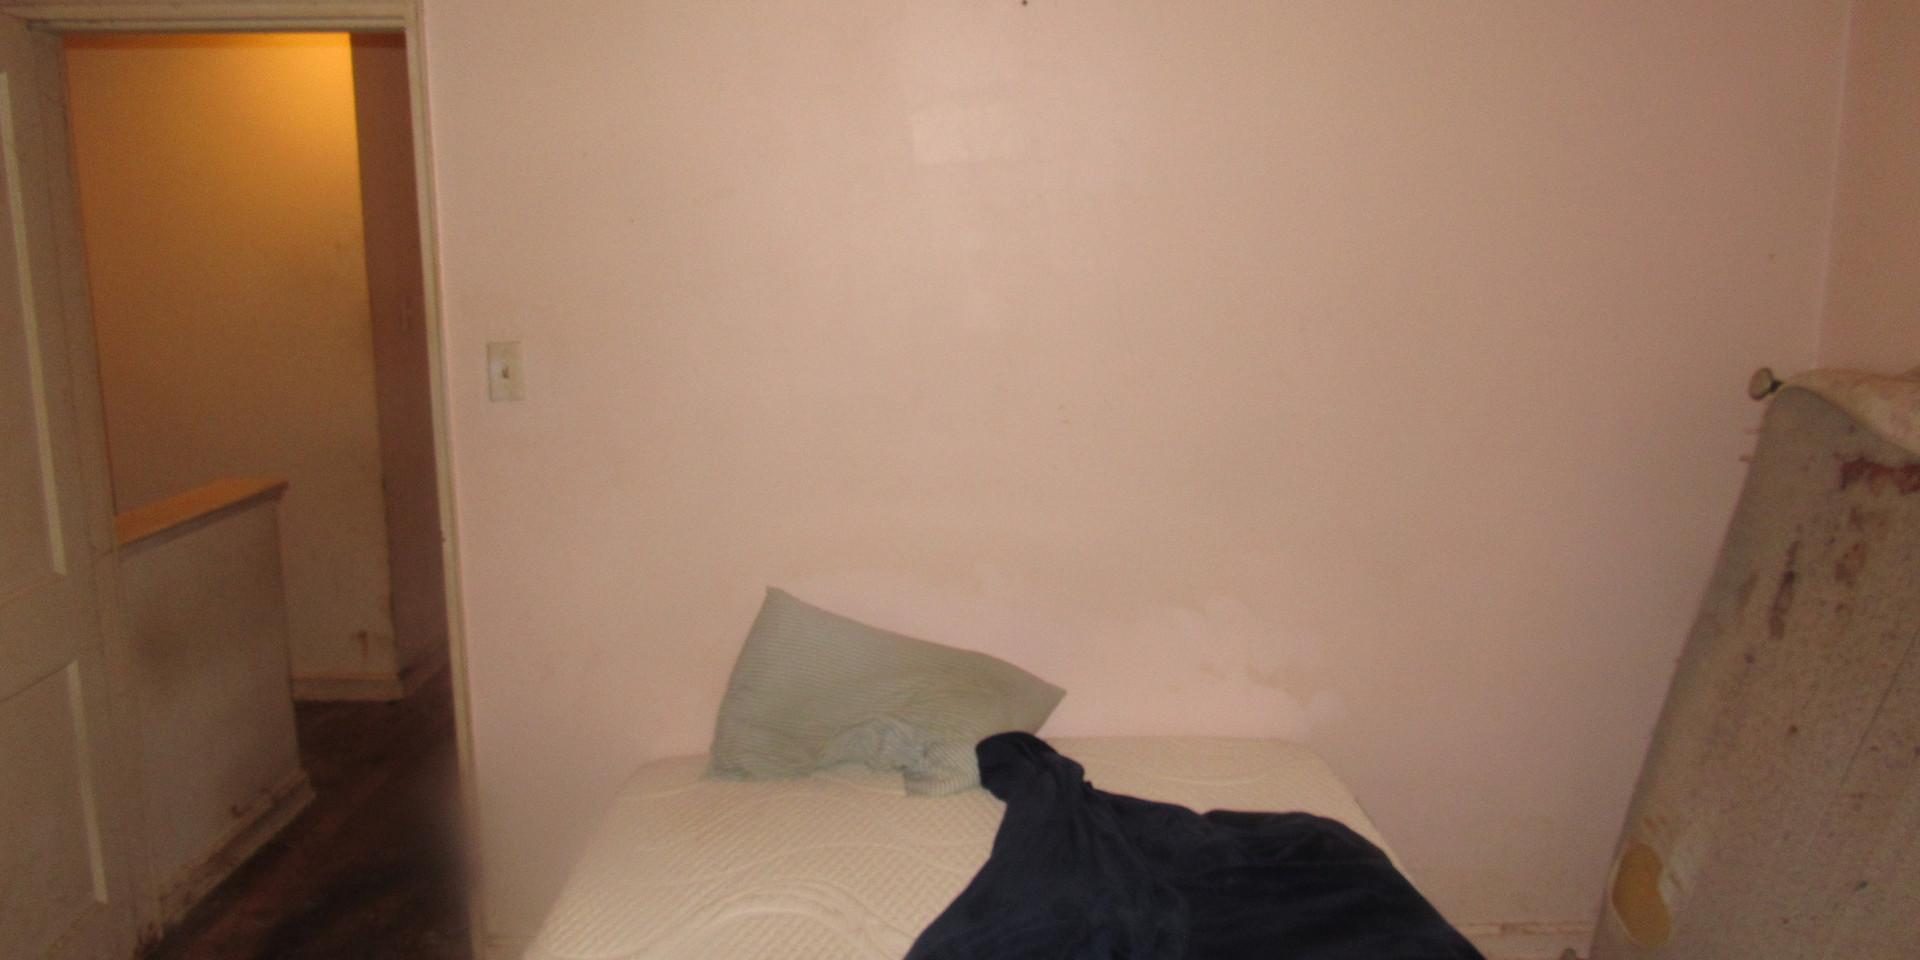 06A Bedroom 1 20 C.JPG